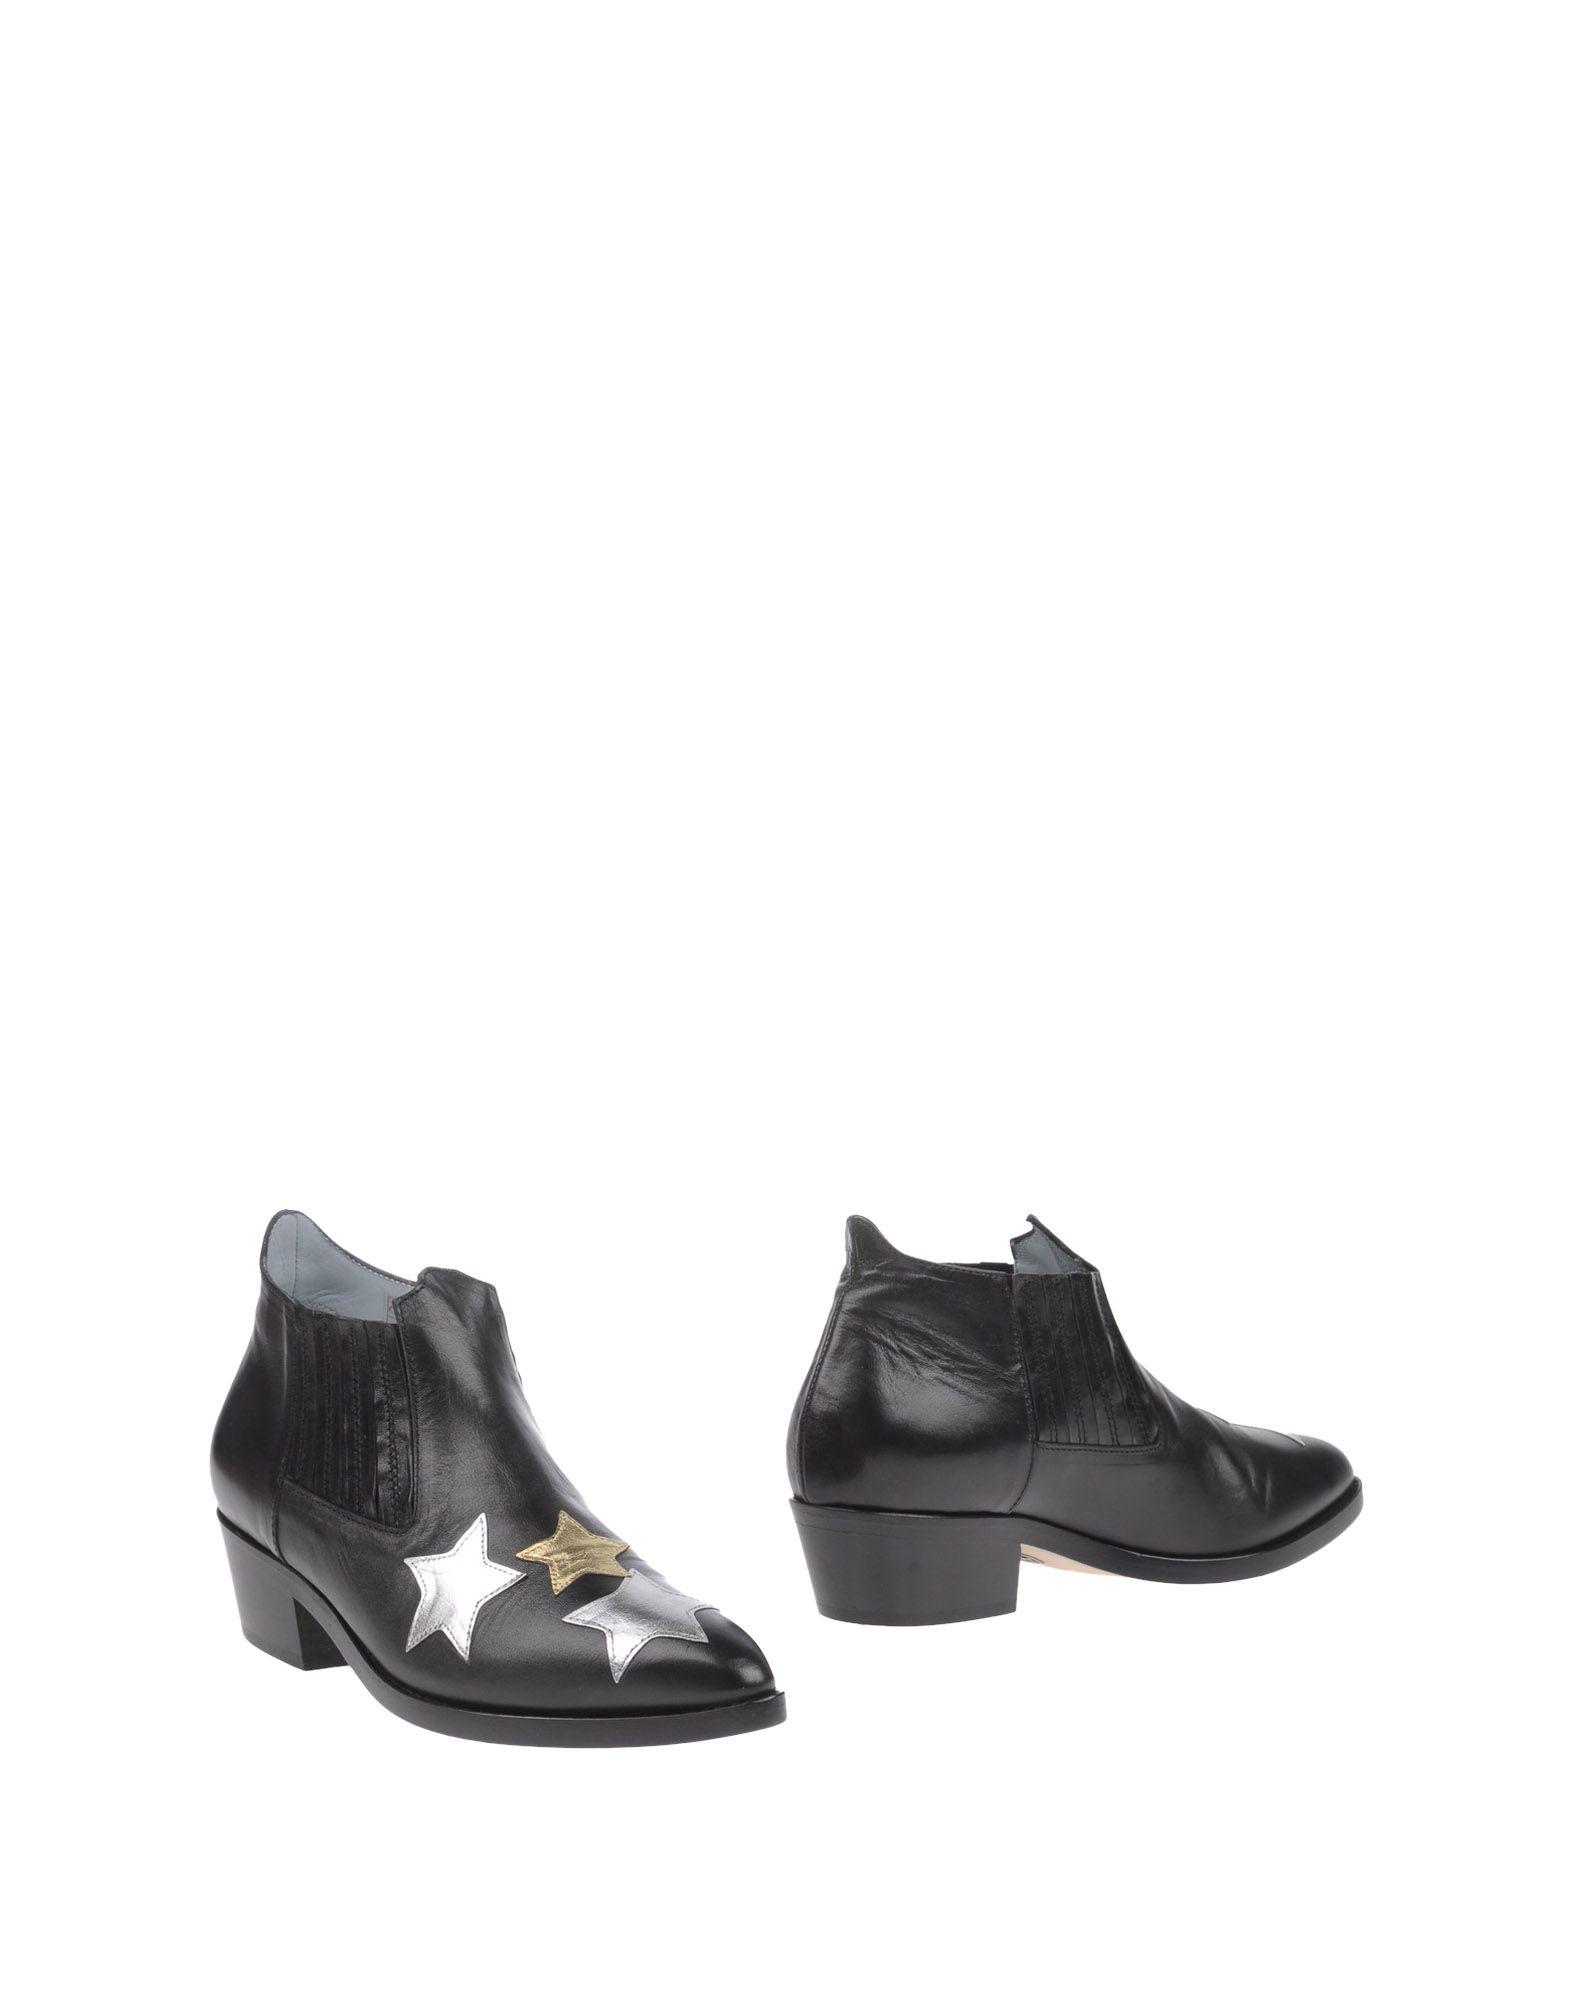 Chiara Ferragni Ankle Ferragni Boot - Women Chiara Ferragni Ankle Ankle Boots online on  Australia - 11211908EI a38997